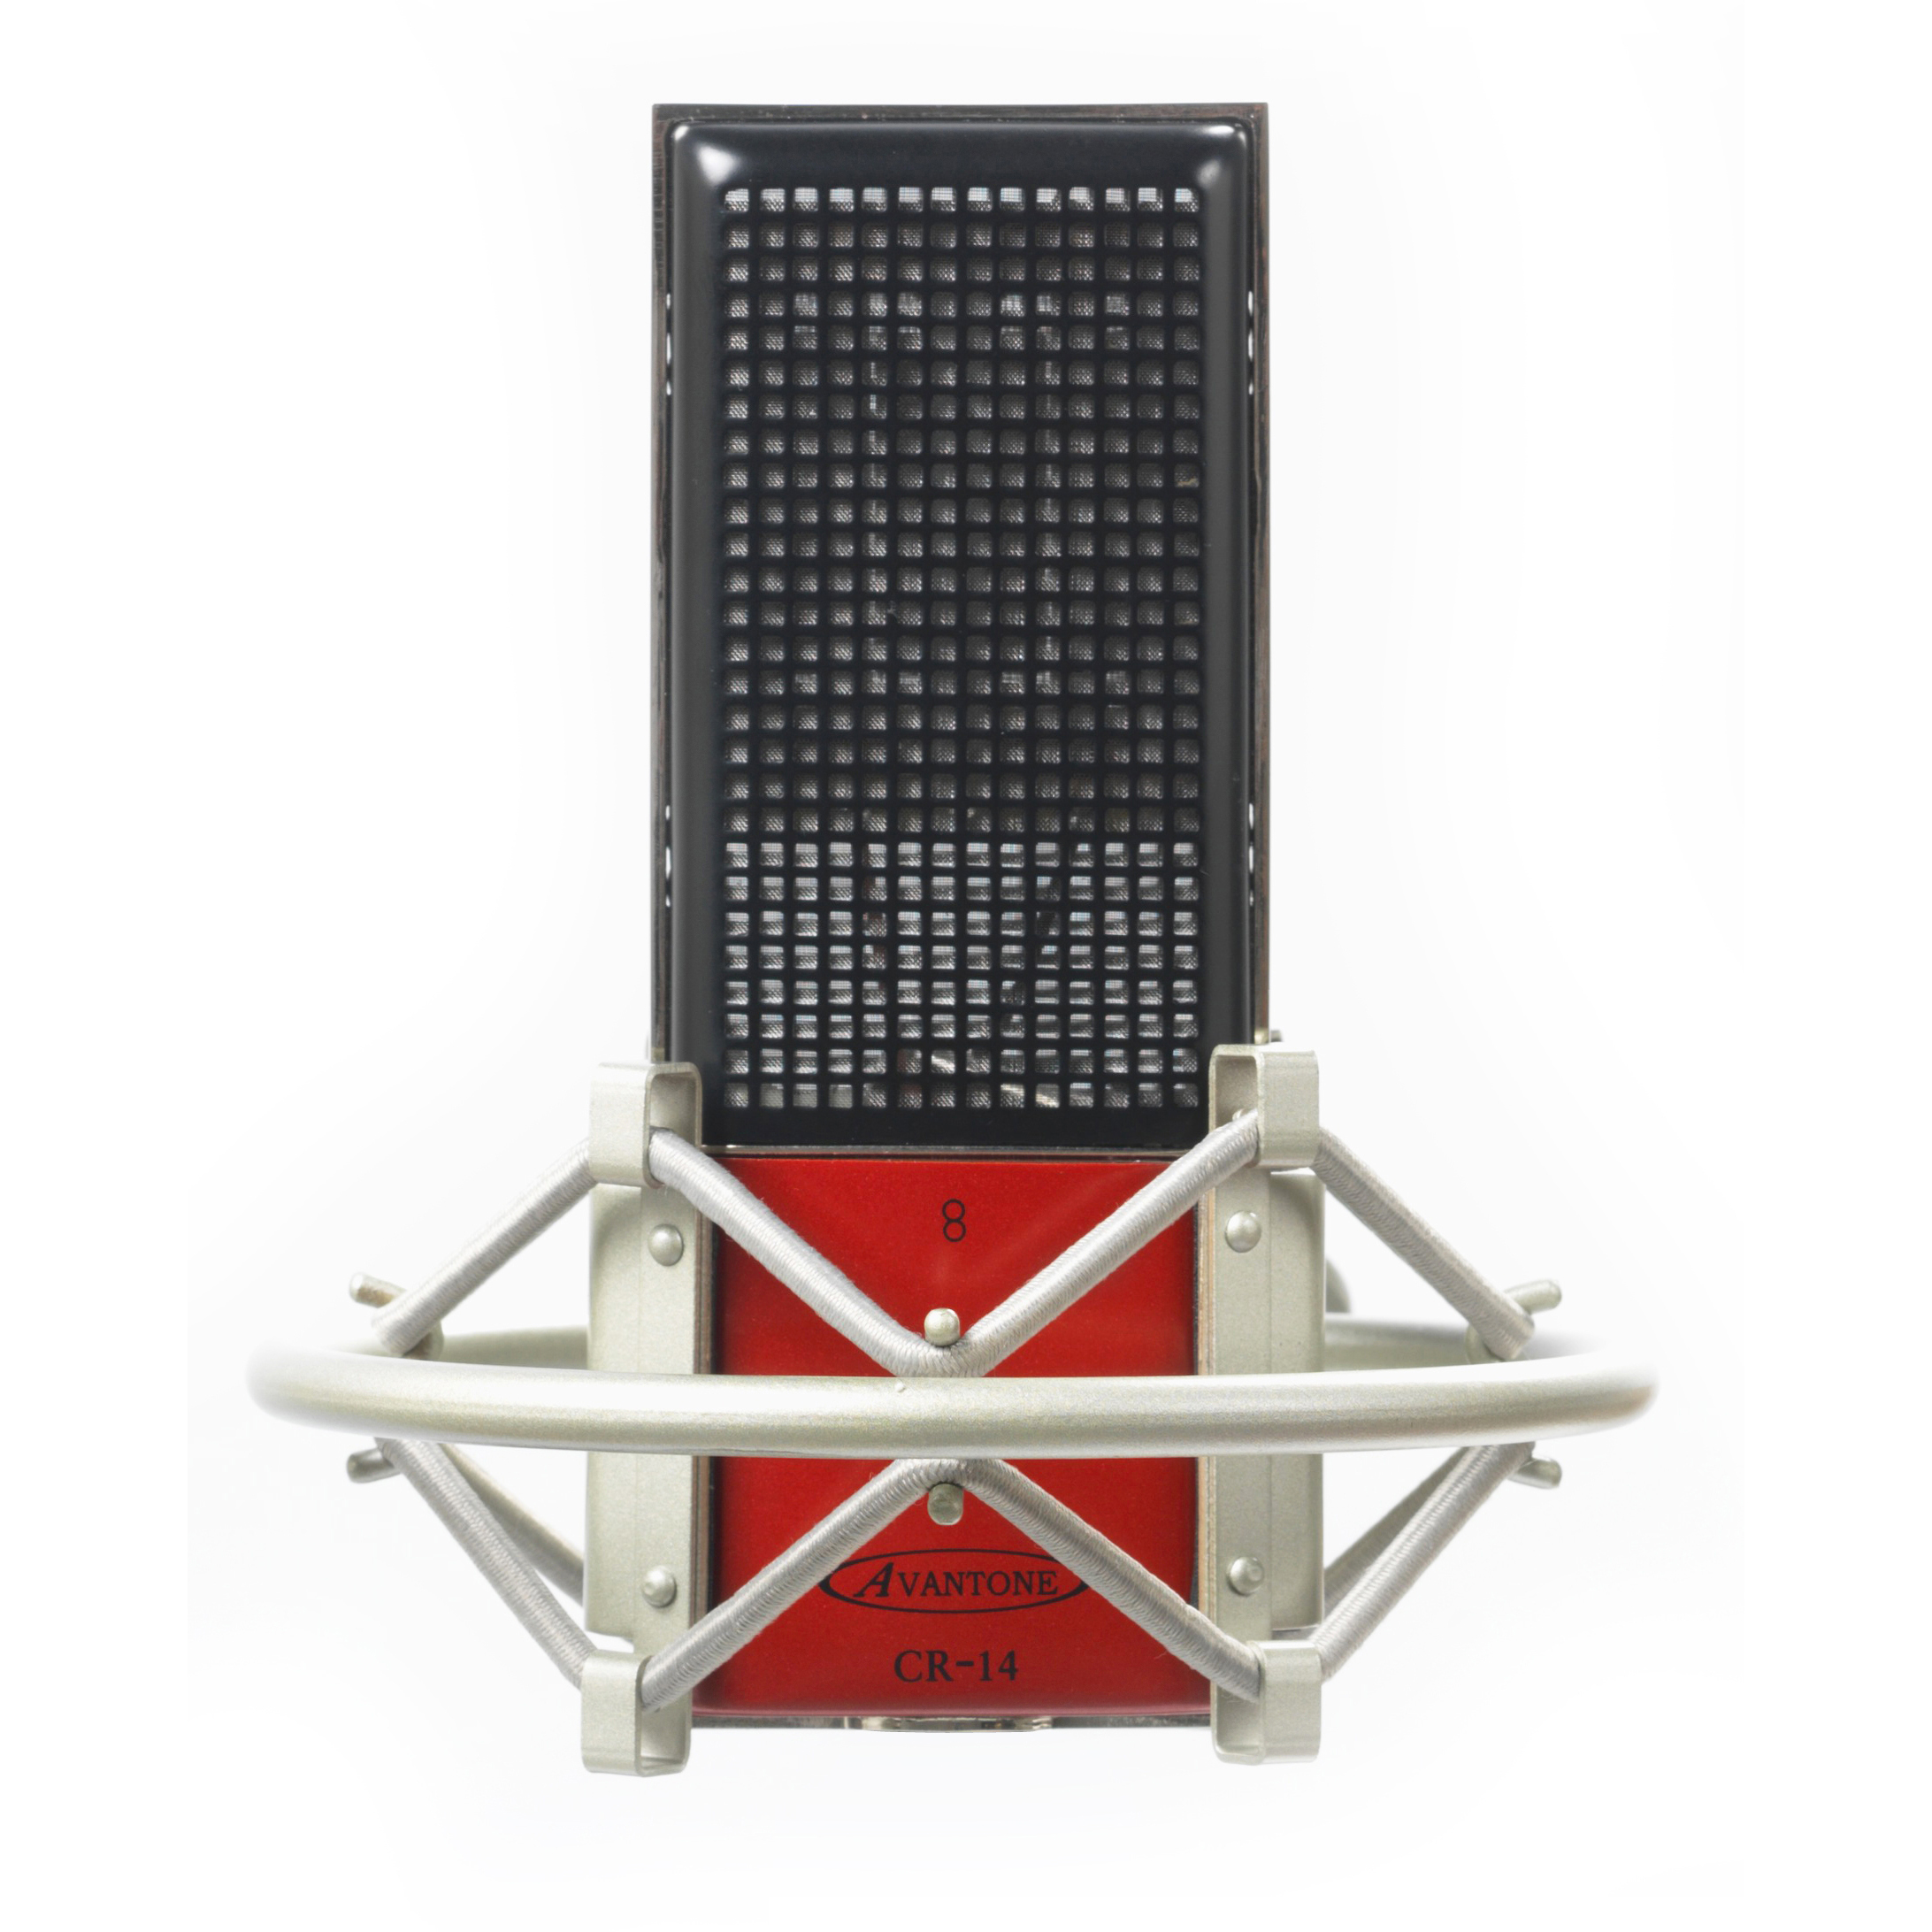 Avantone CR-14 bandmikrofon